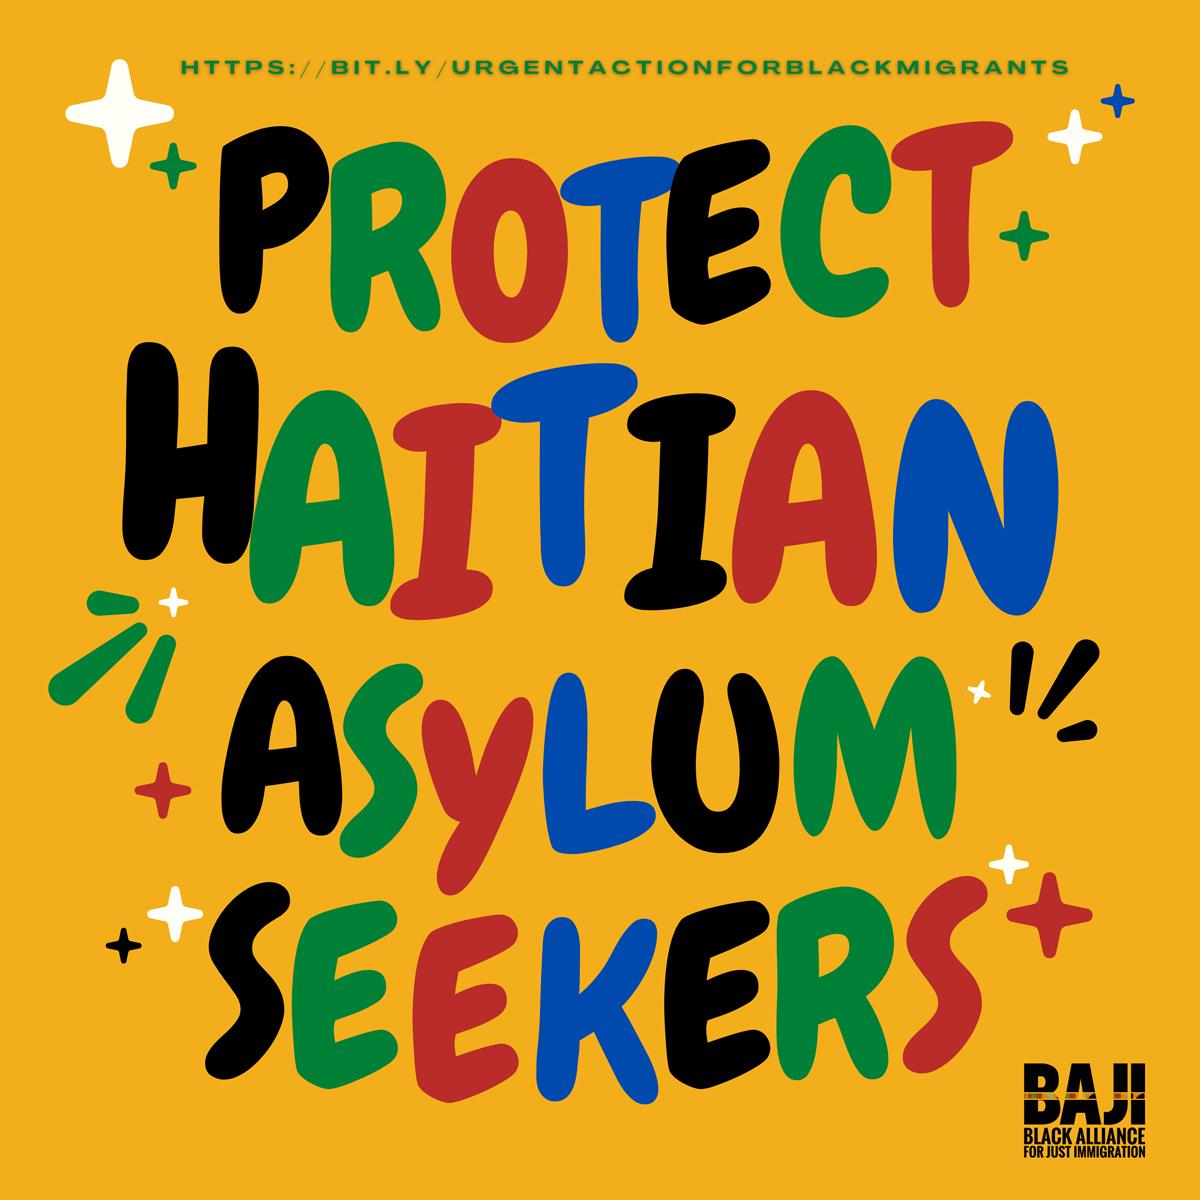 Protect Haitian Asylum Seekers Toolkit